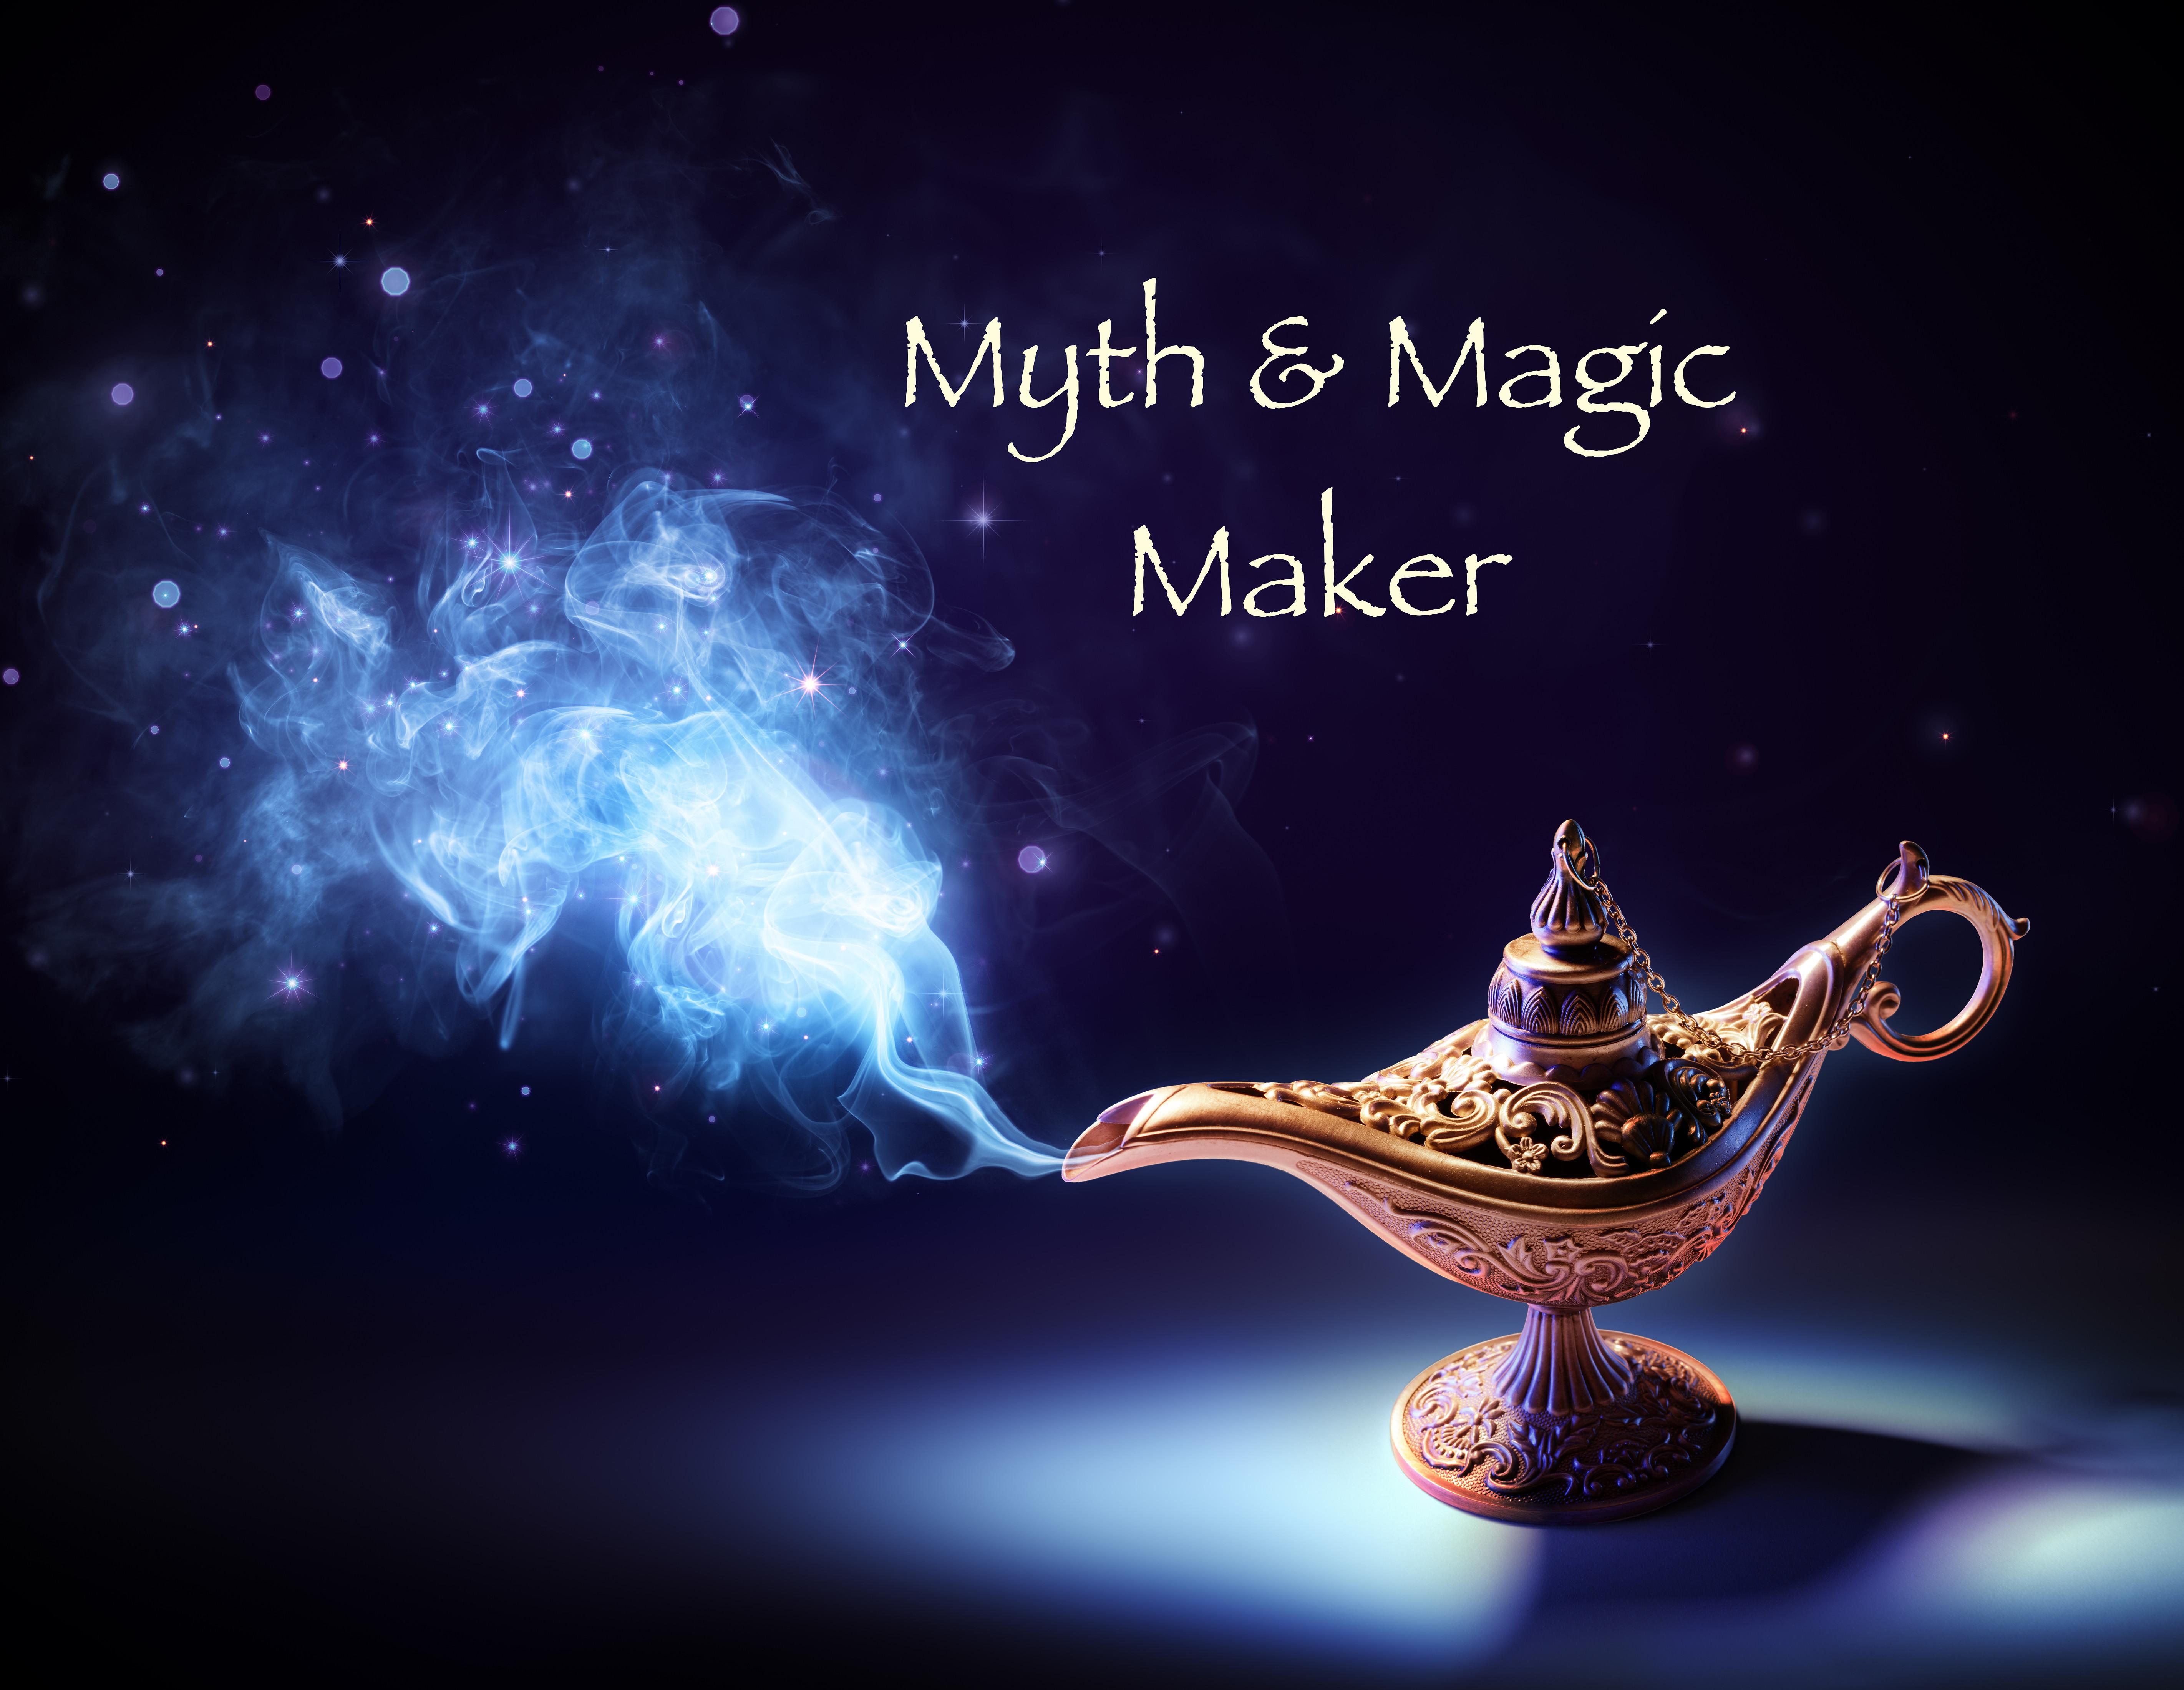 Myth & Magic Maker